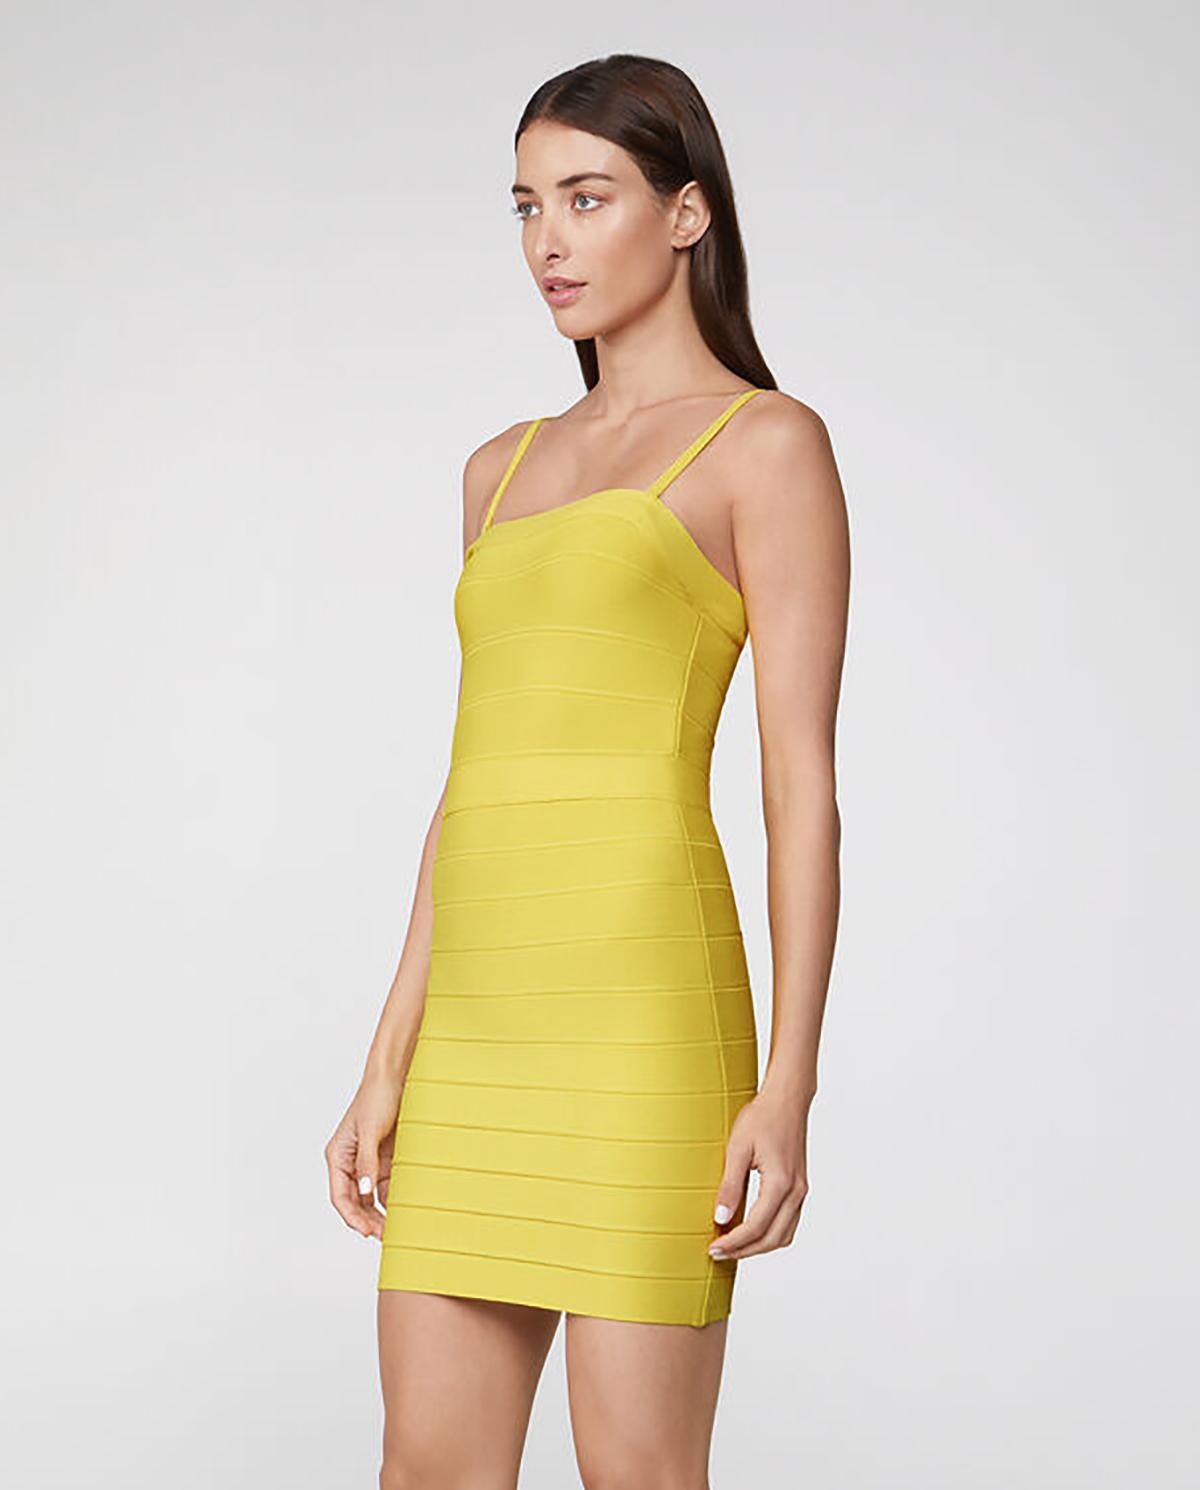 Żółta sukienka na ramiączkach Herve Leger 46HLT8269900-755